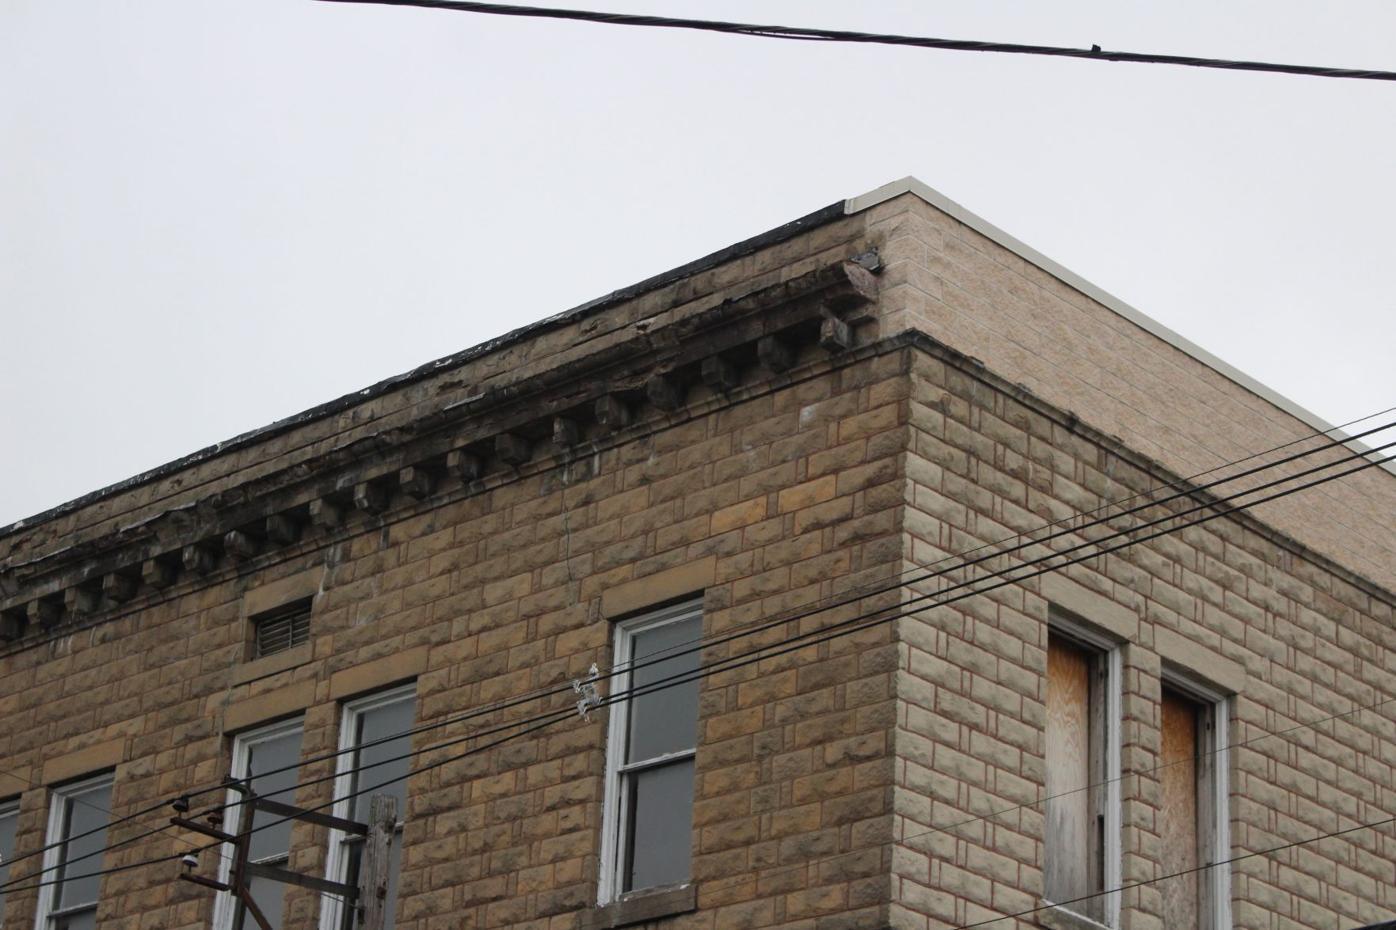 Herring Building top